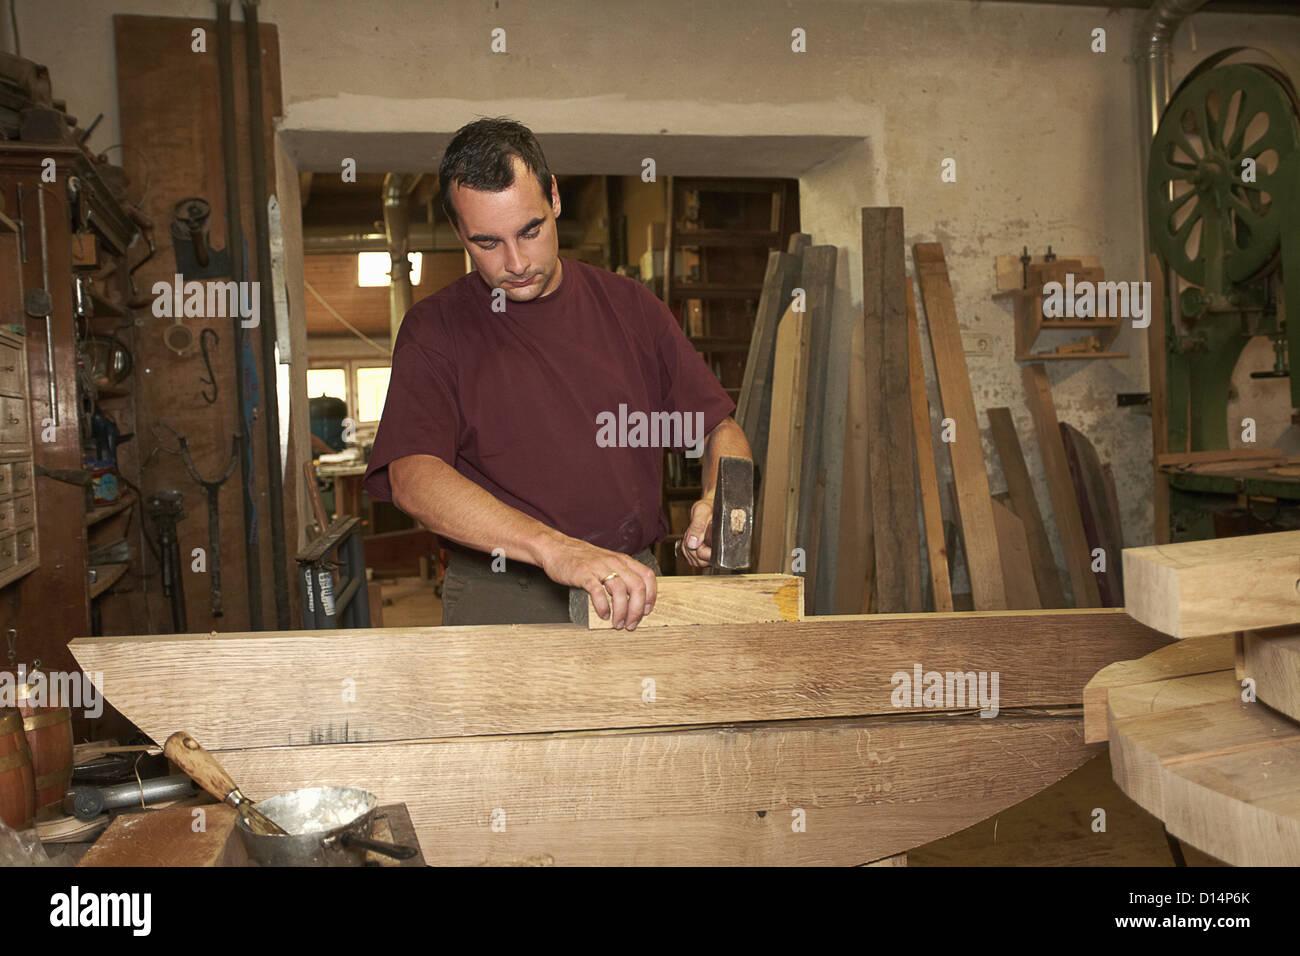 Worker hammering wood in shop - Stock Image